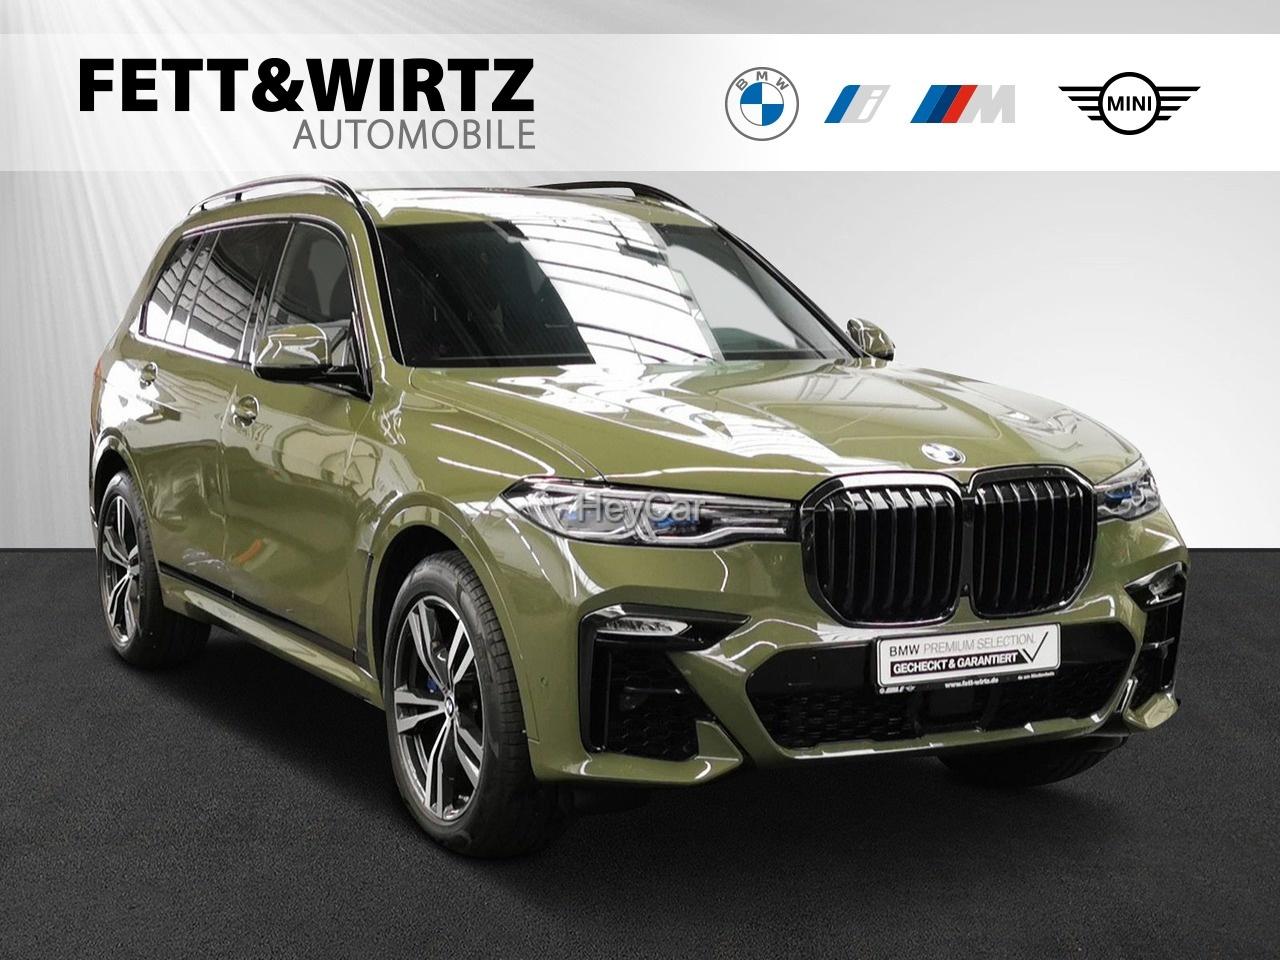 BMW X7 xDrive40d M Sport ''Urban Green'' AHK 6-Sitzer, Jahr 2021, Diesel